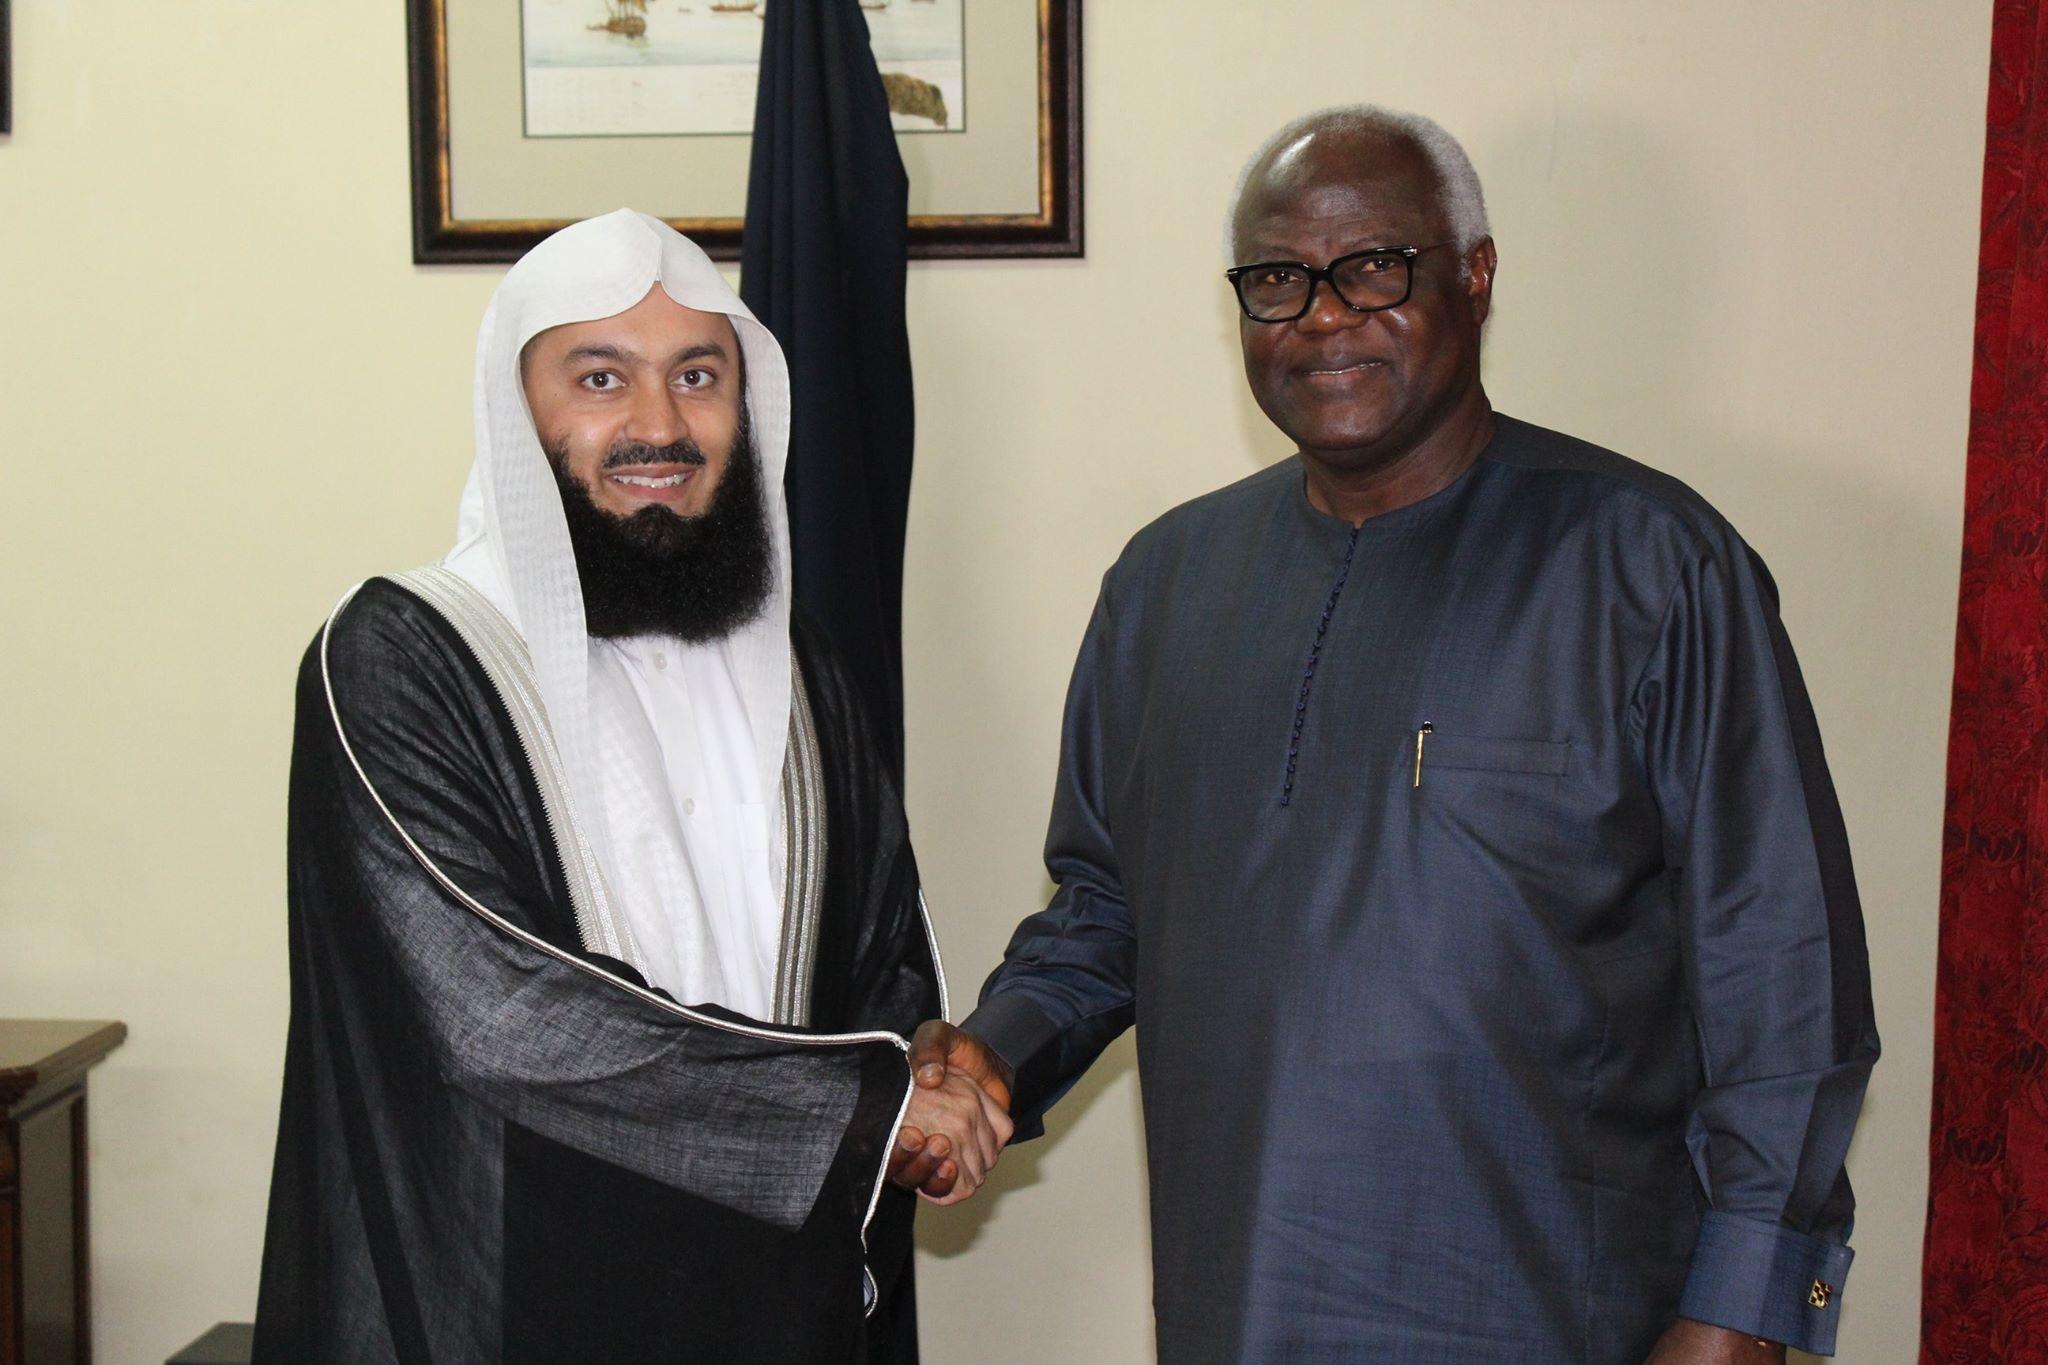 Biography mufti menk Sheikh Mufti